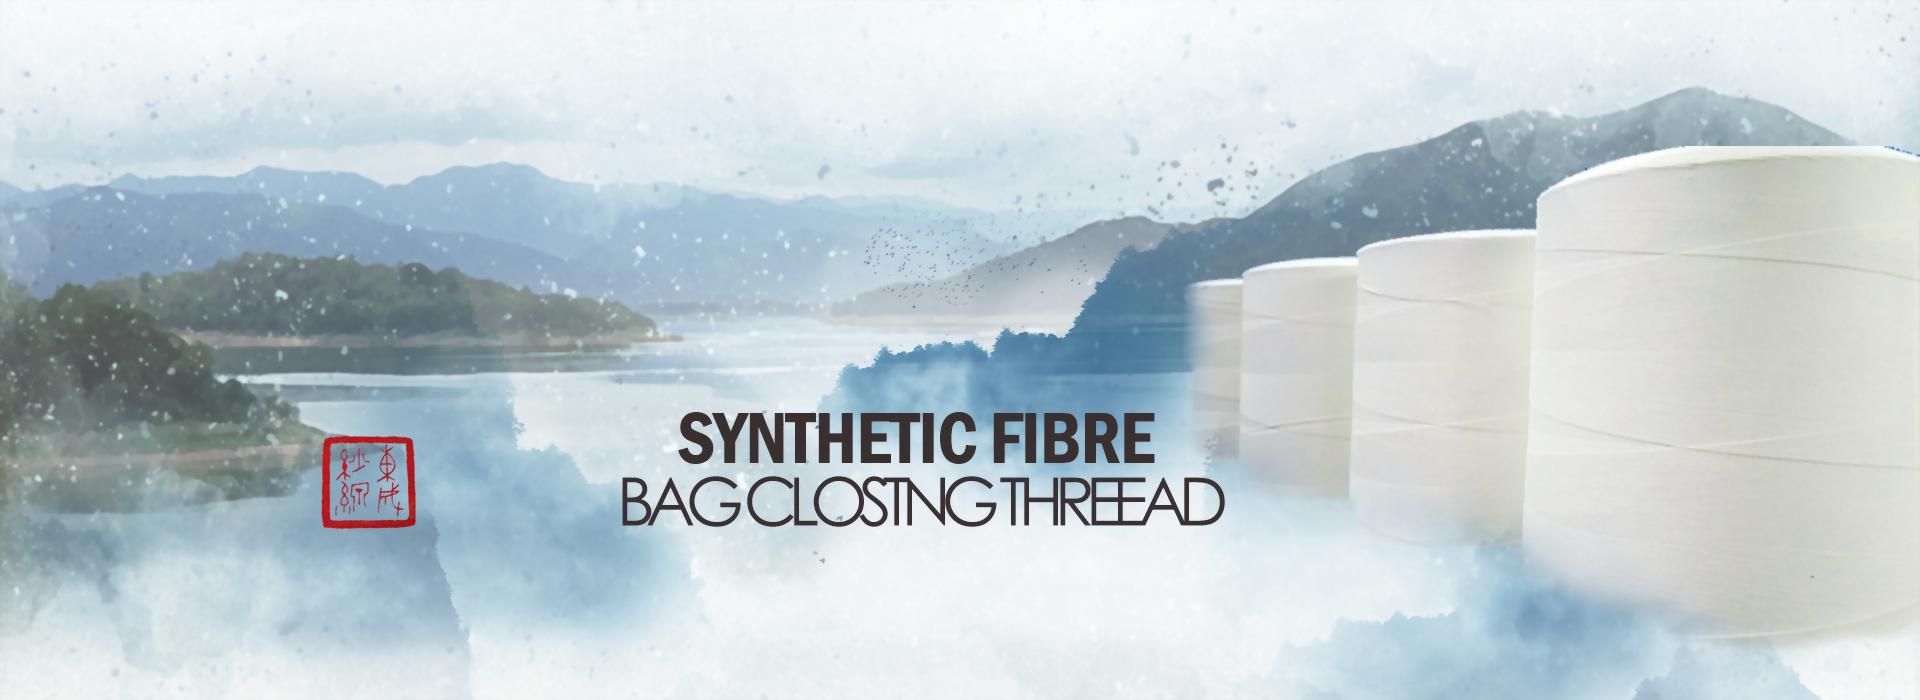 Bag closing thread manufacturer